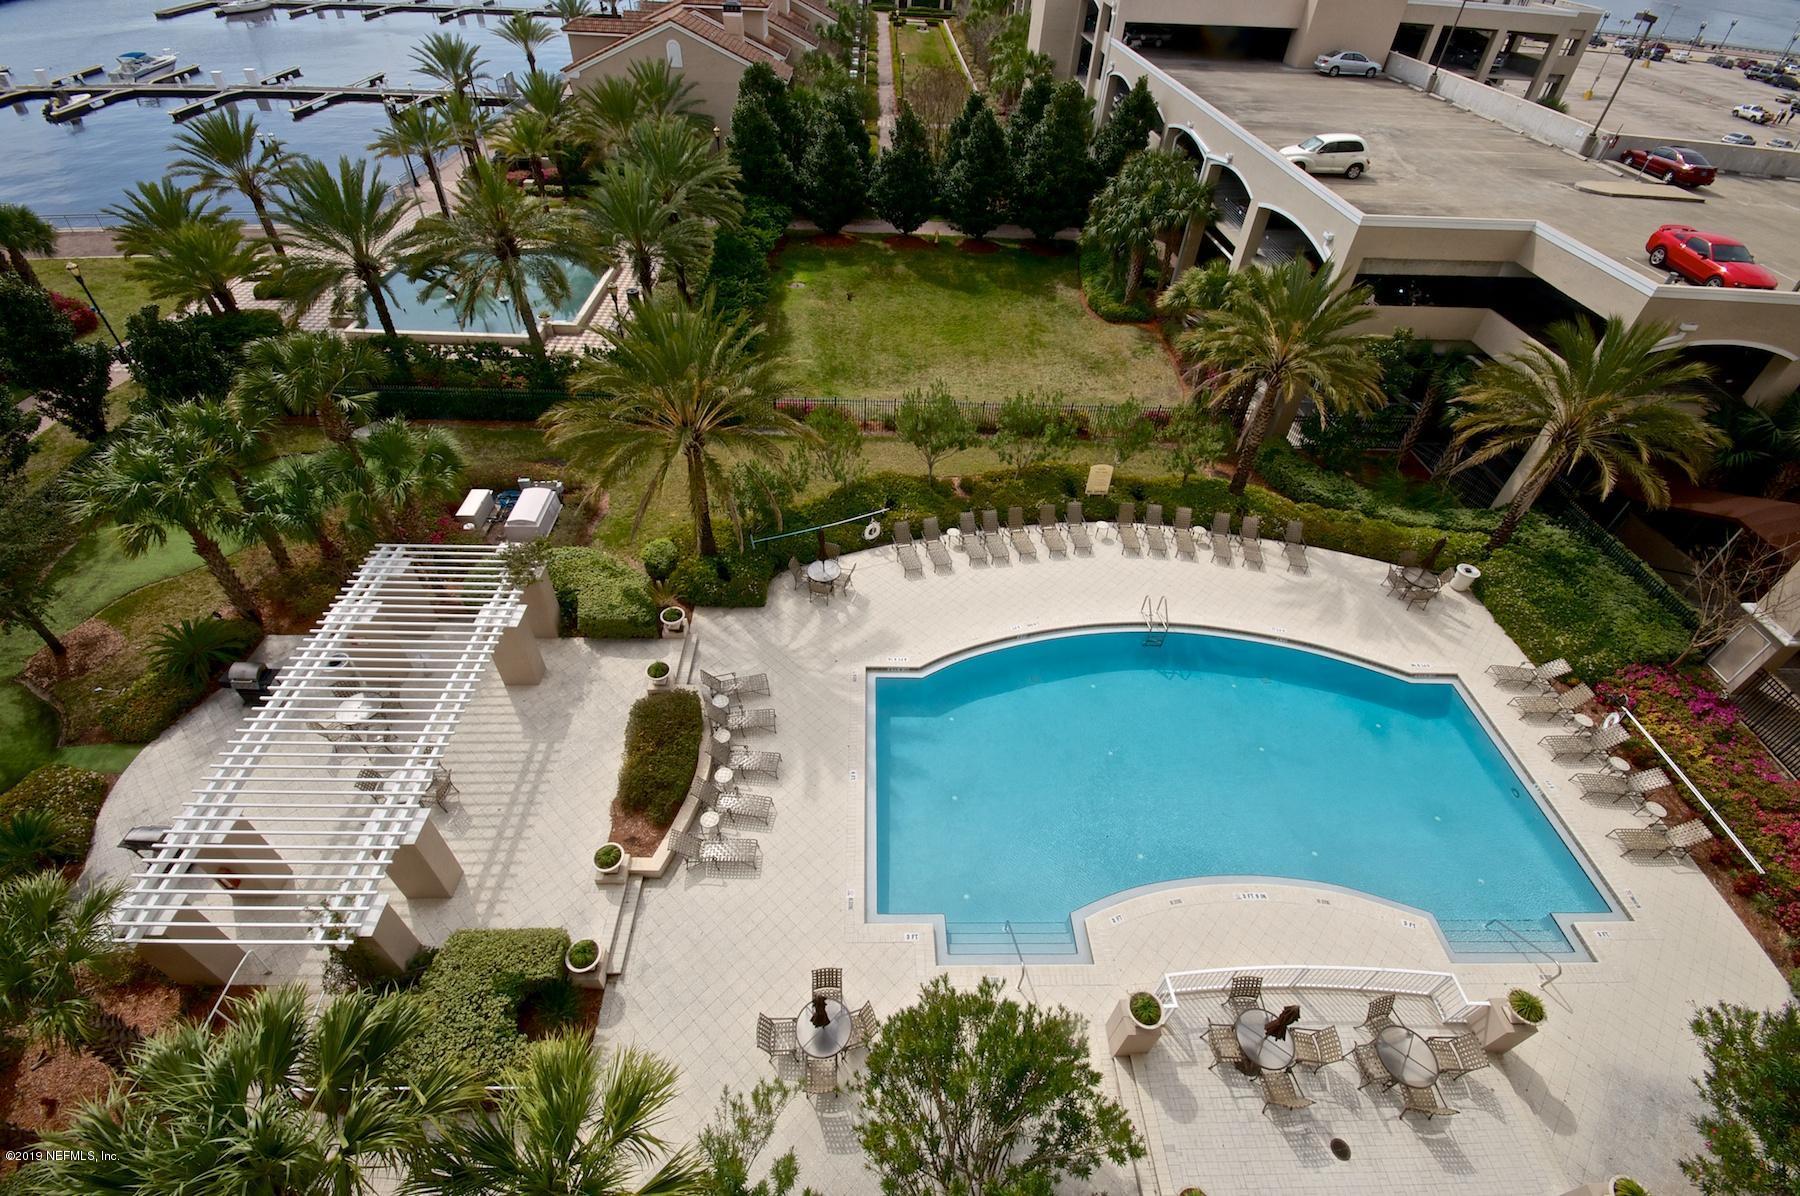 434 BAY, JACKSONVILLE, FLORIDA 32202, 2 Bedrooms Bedrooms, ,2 BathroomsBathrooms,Residential,For sale,BAY,1082264